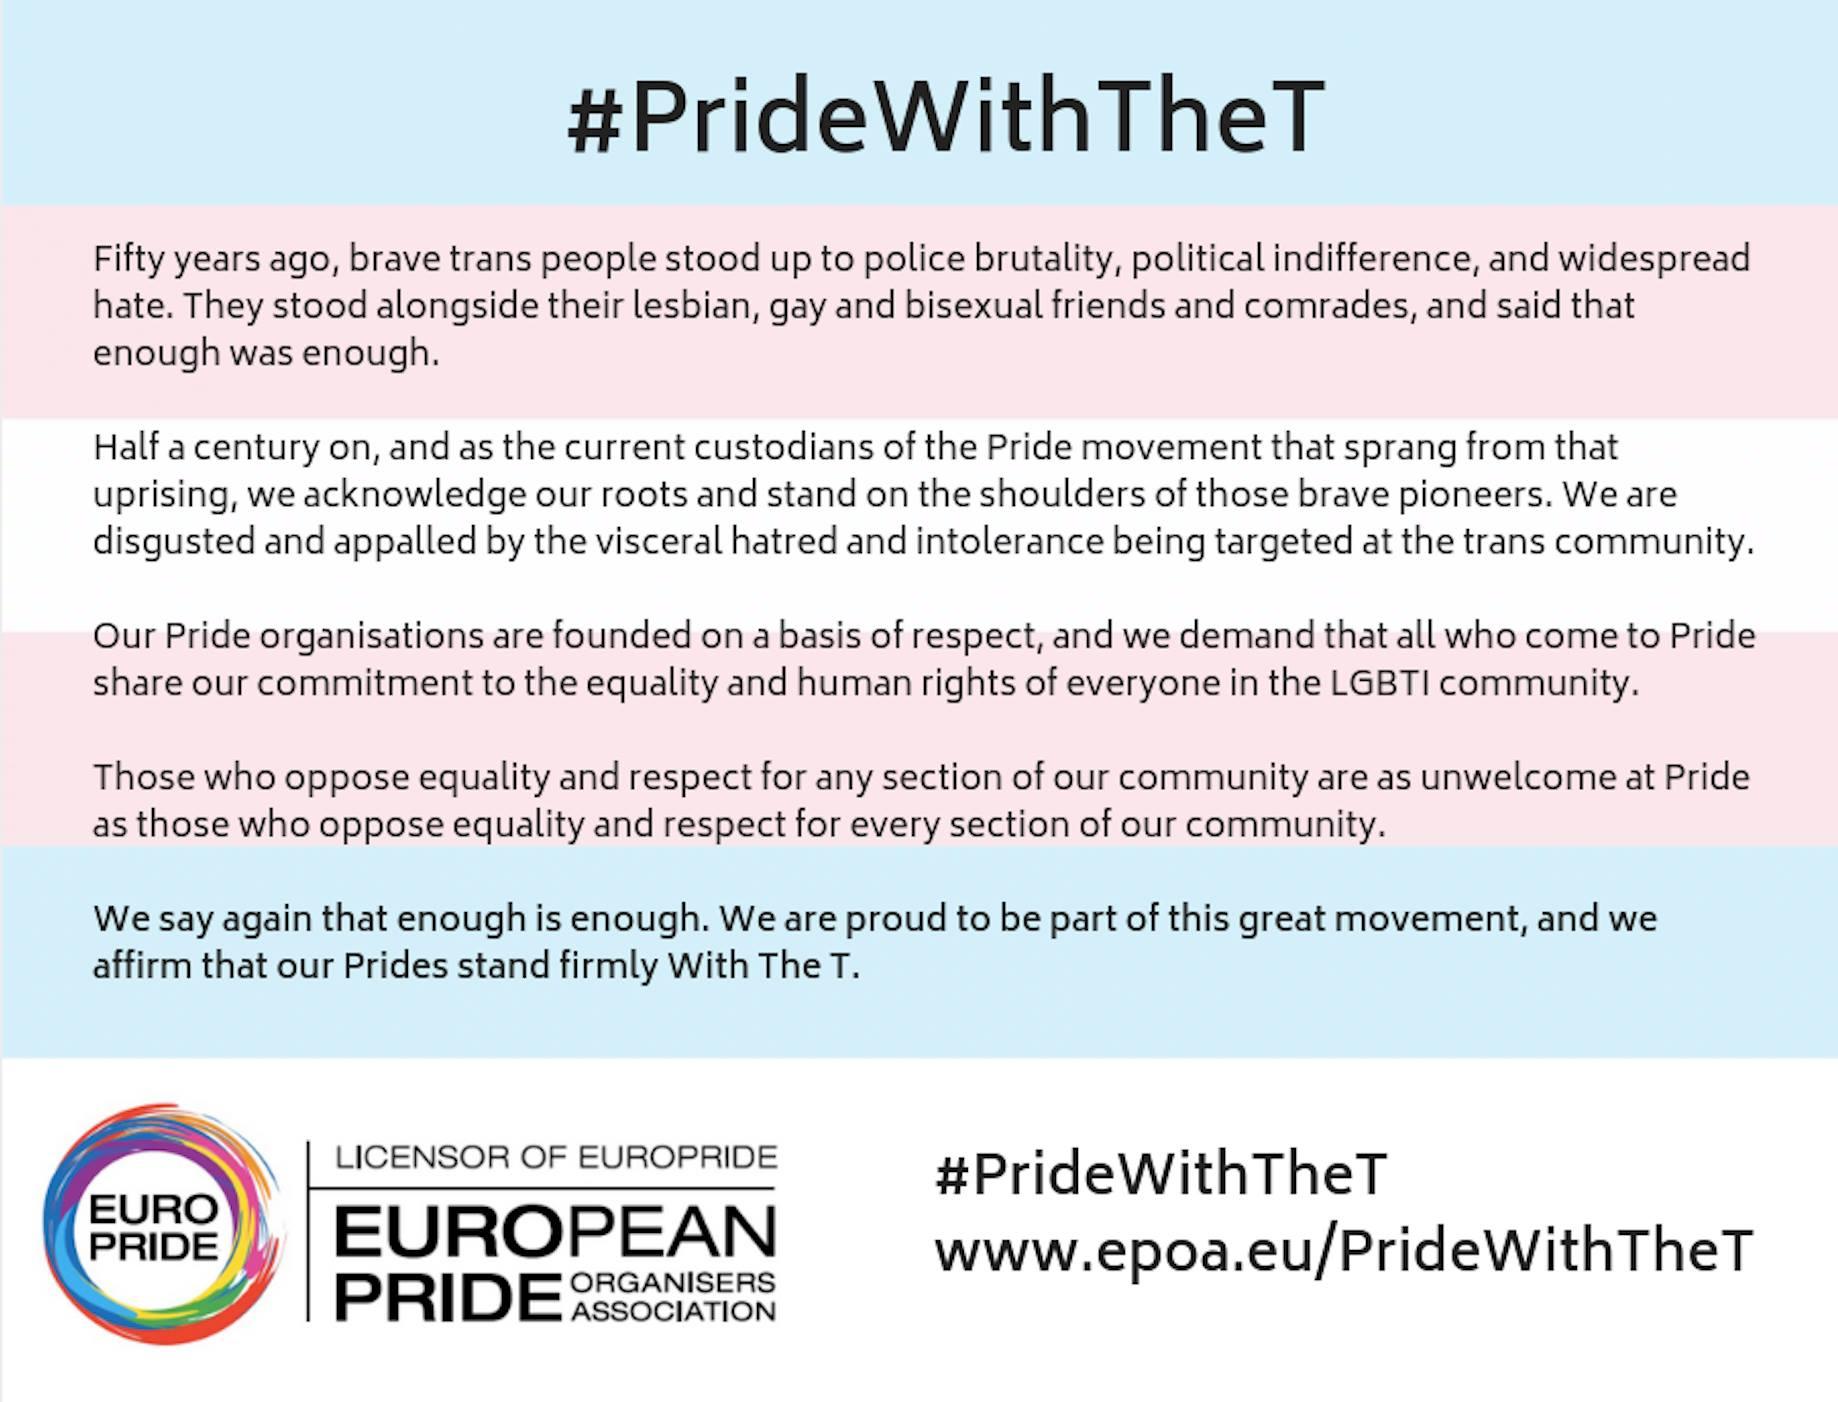 PrideWithTheT